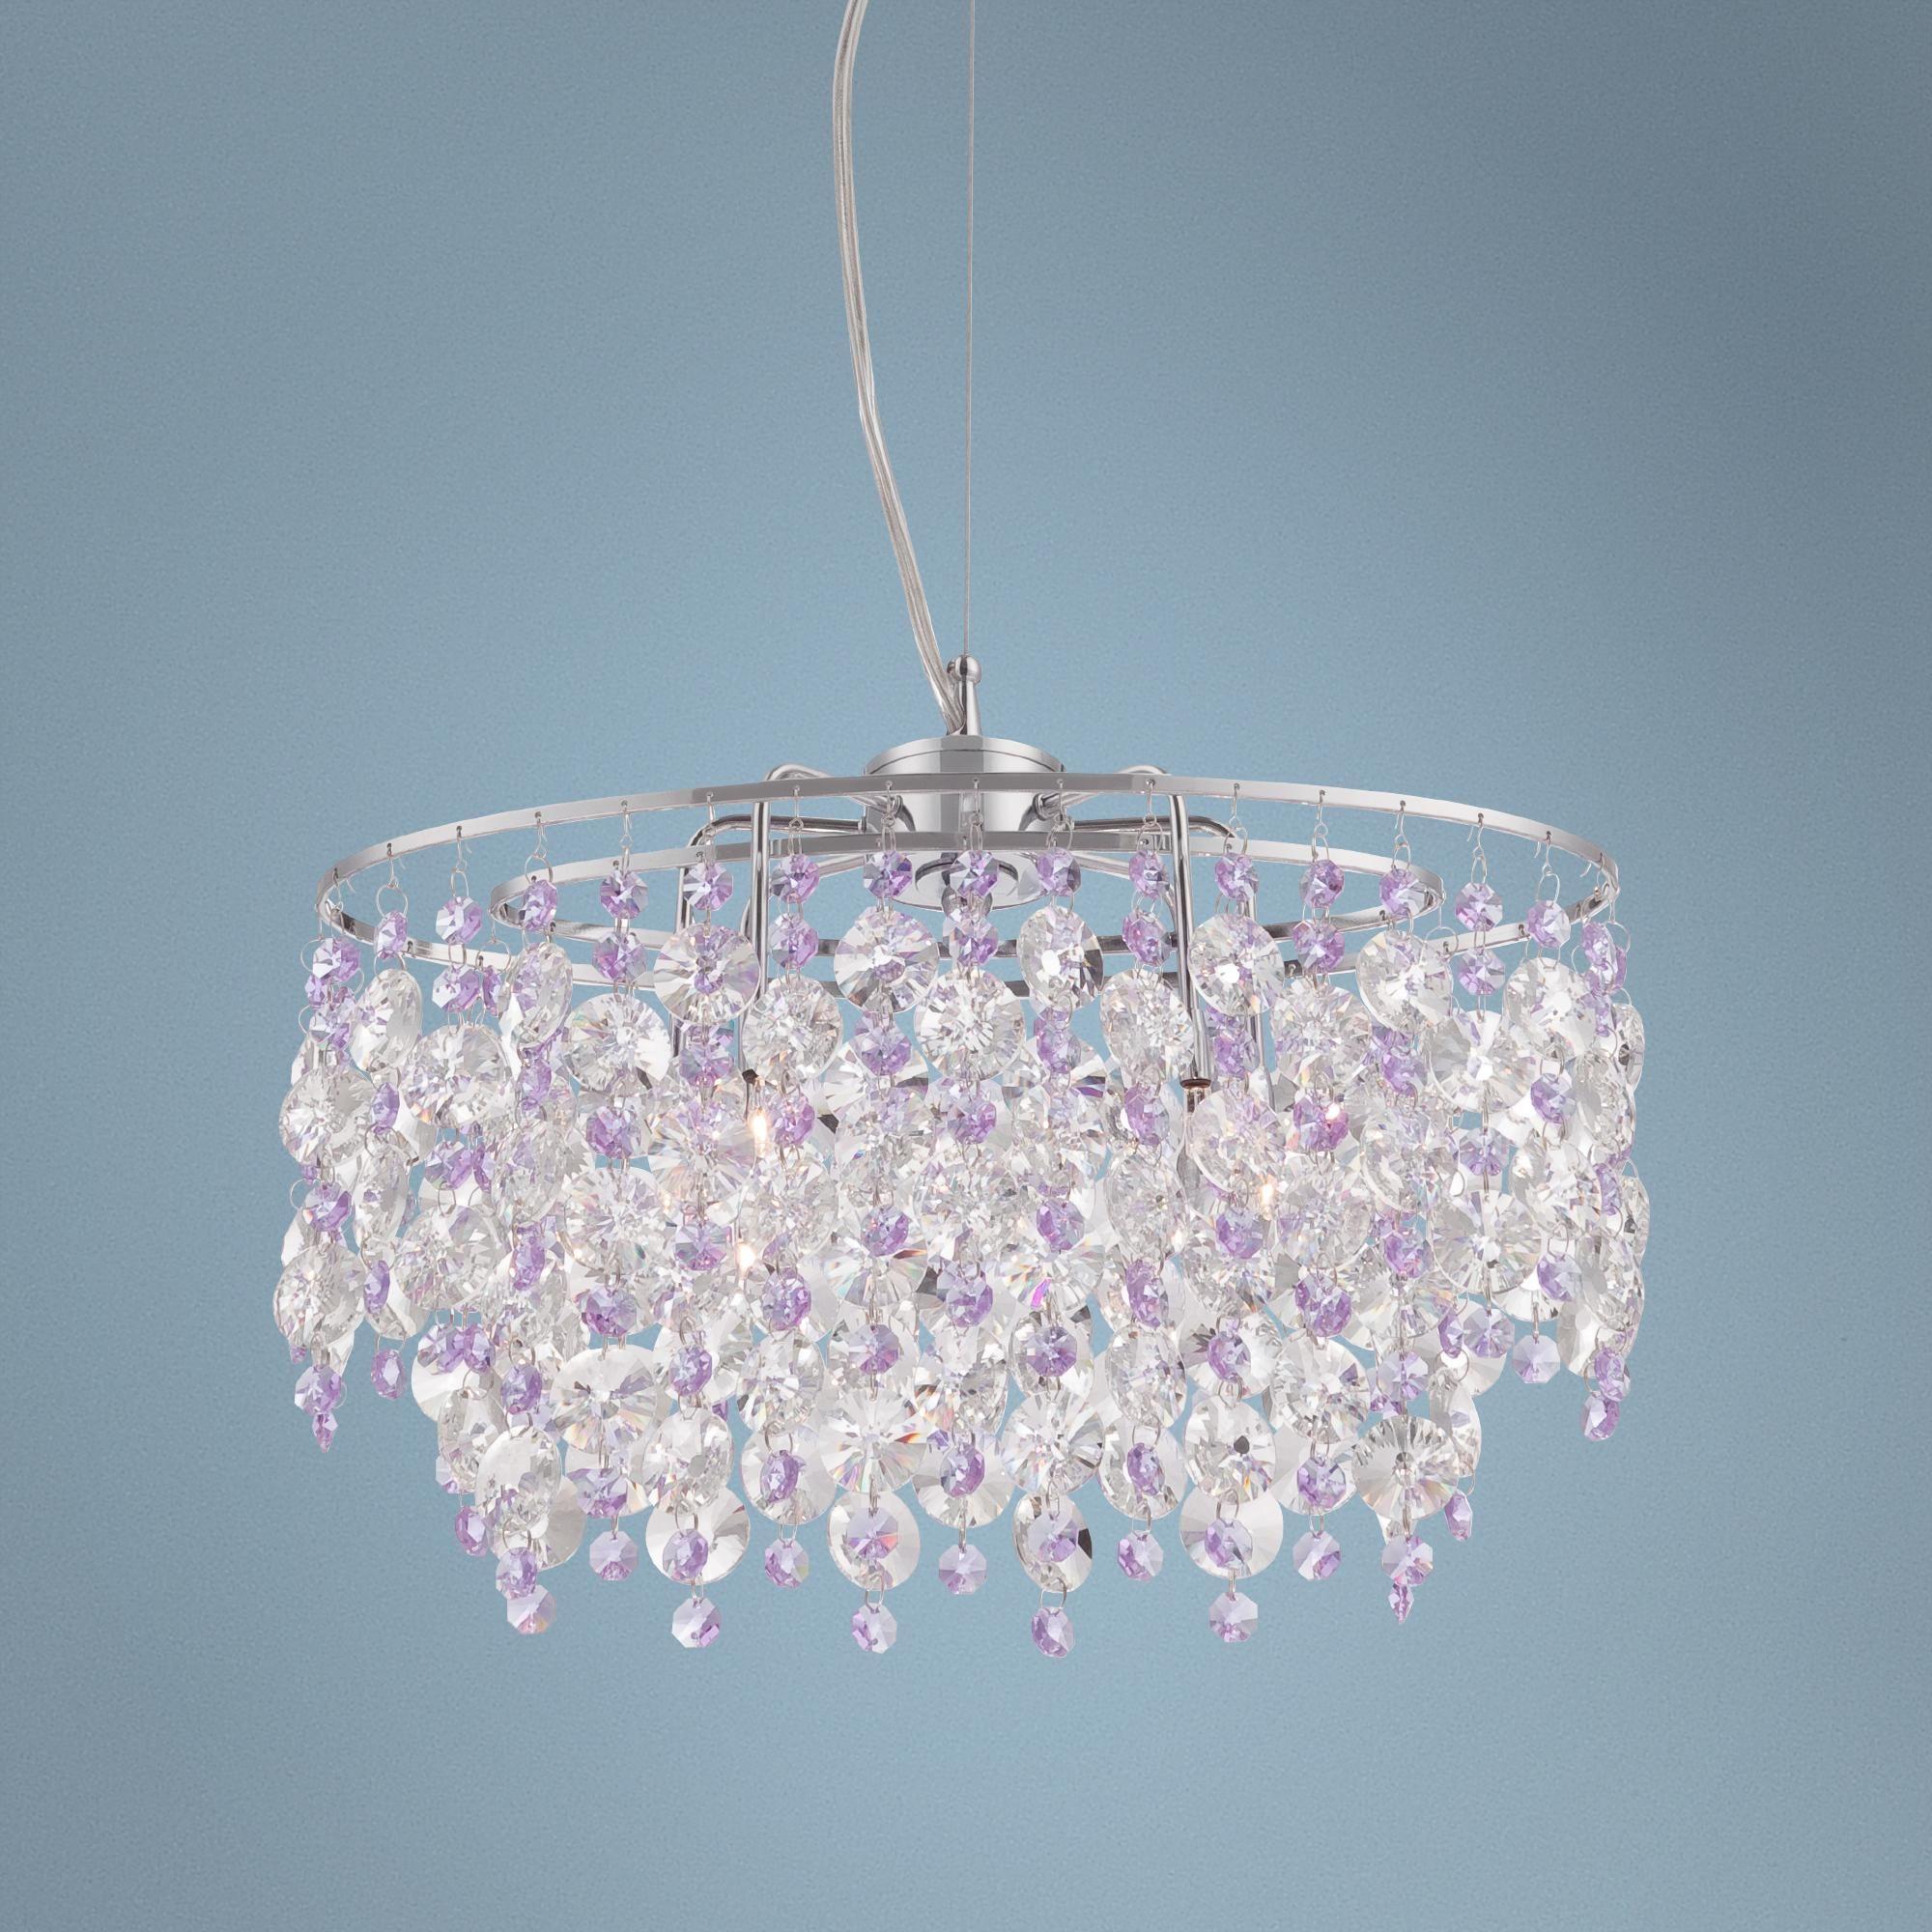 Abigail 15 wide purple crystal pendant chandelier design abigail 15 wide purple crystal pendant chandelier arubaitofo Image collections